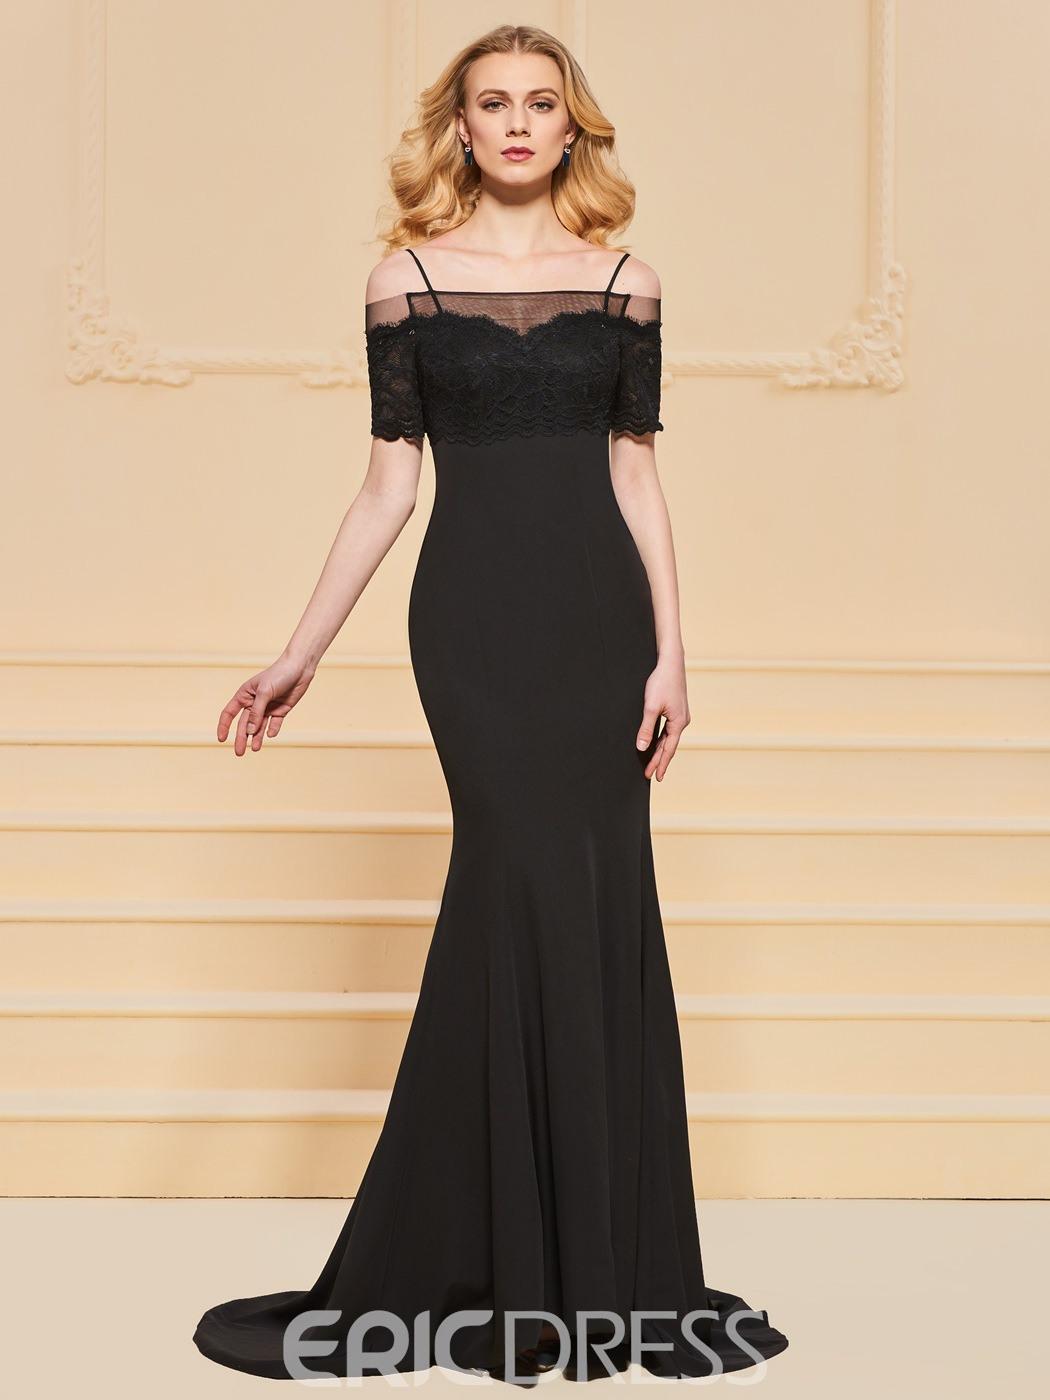 15 Großartig Meerjungfrau Abendkleid Stylish15 Luxus Meerjungfrau Abendkleid Design